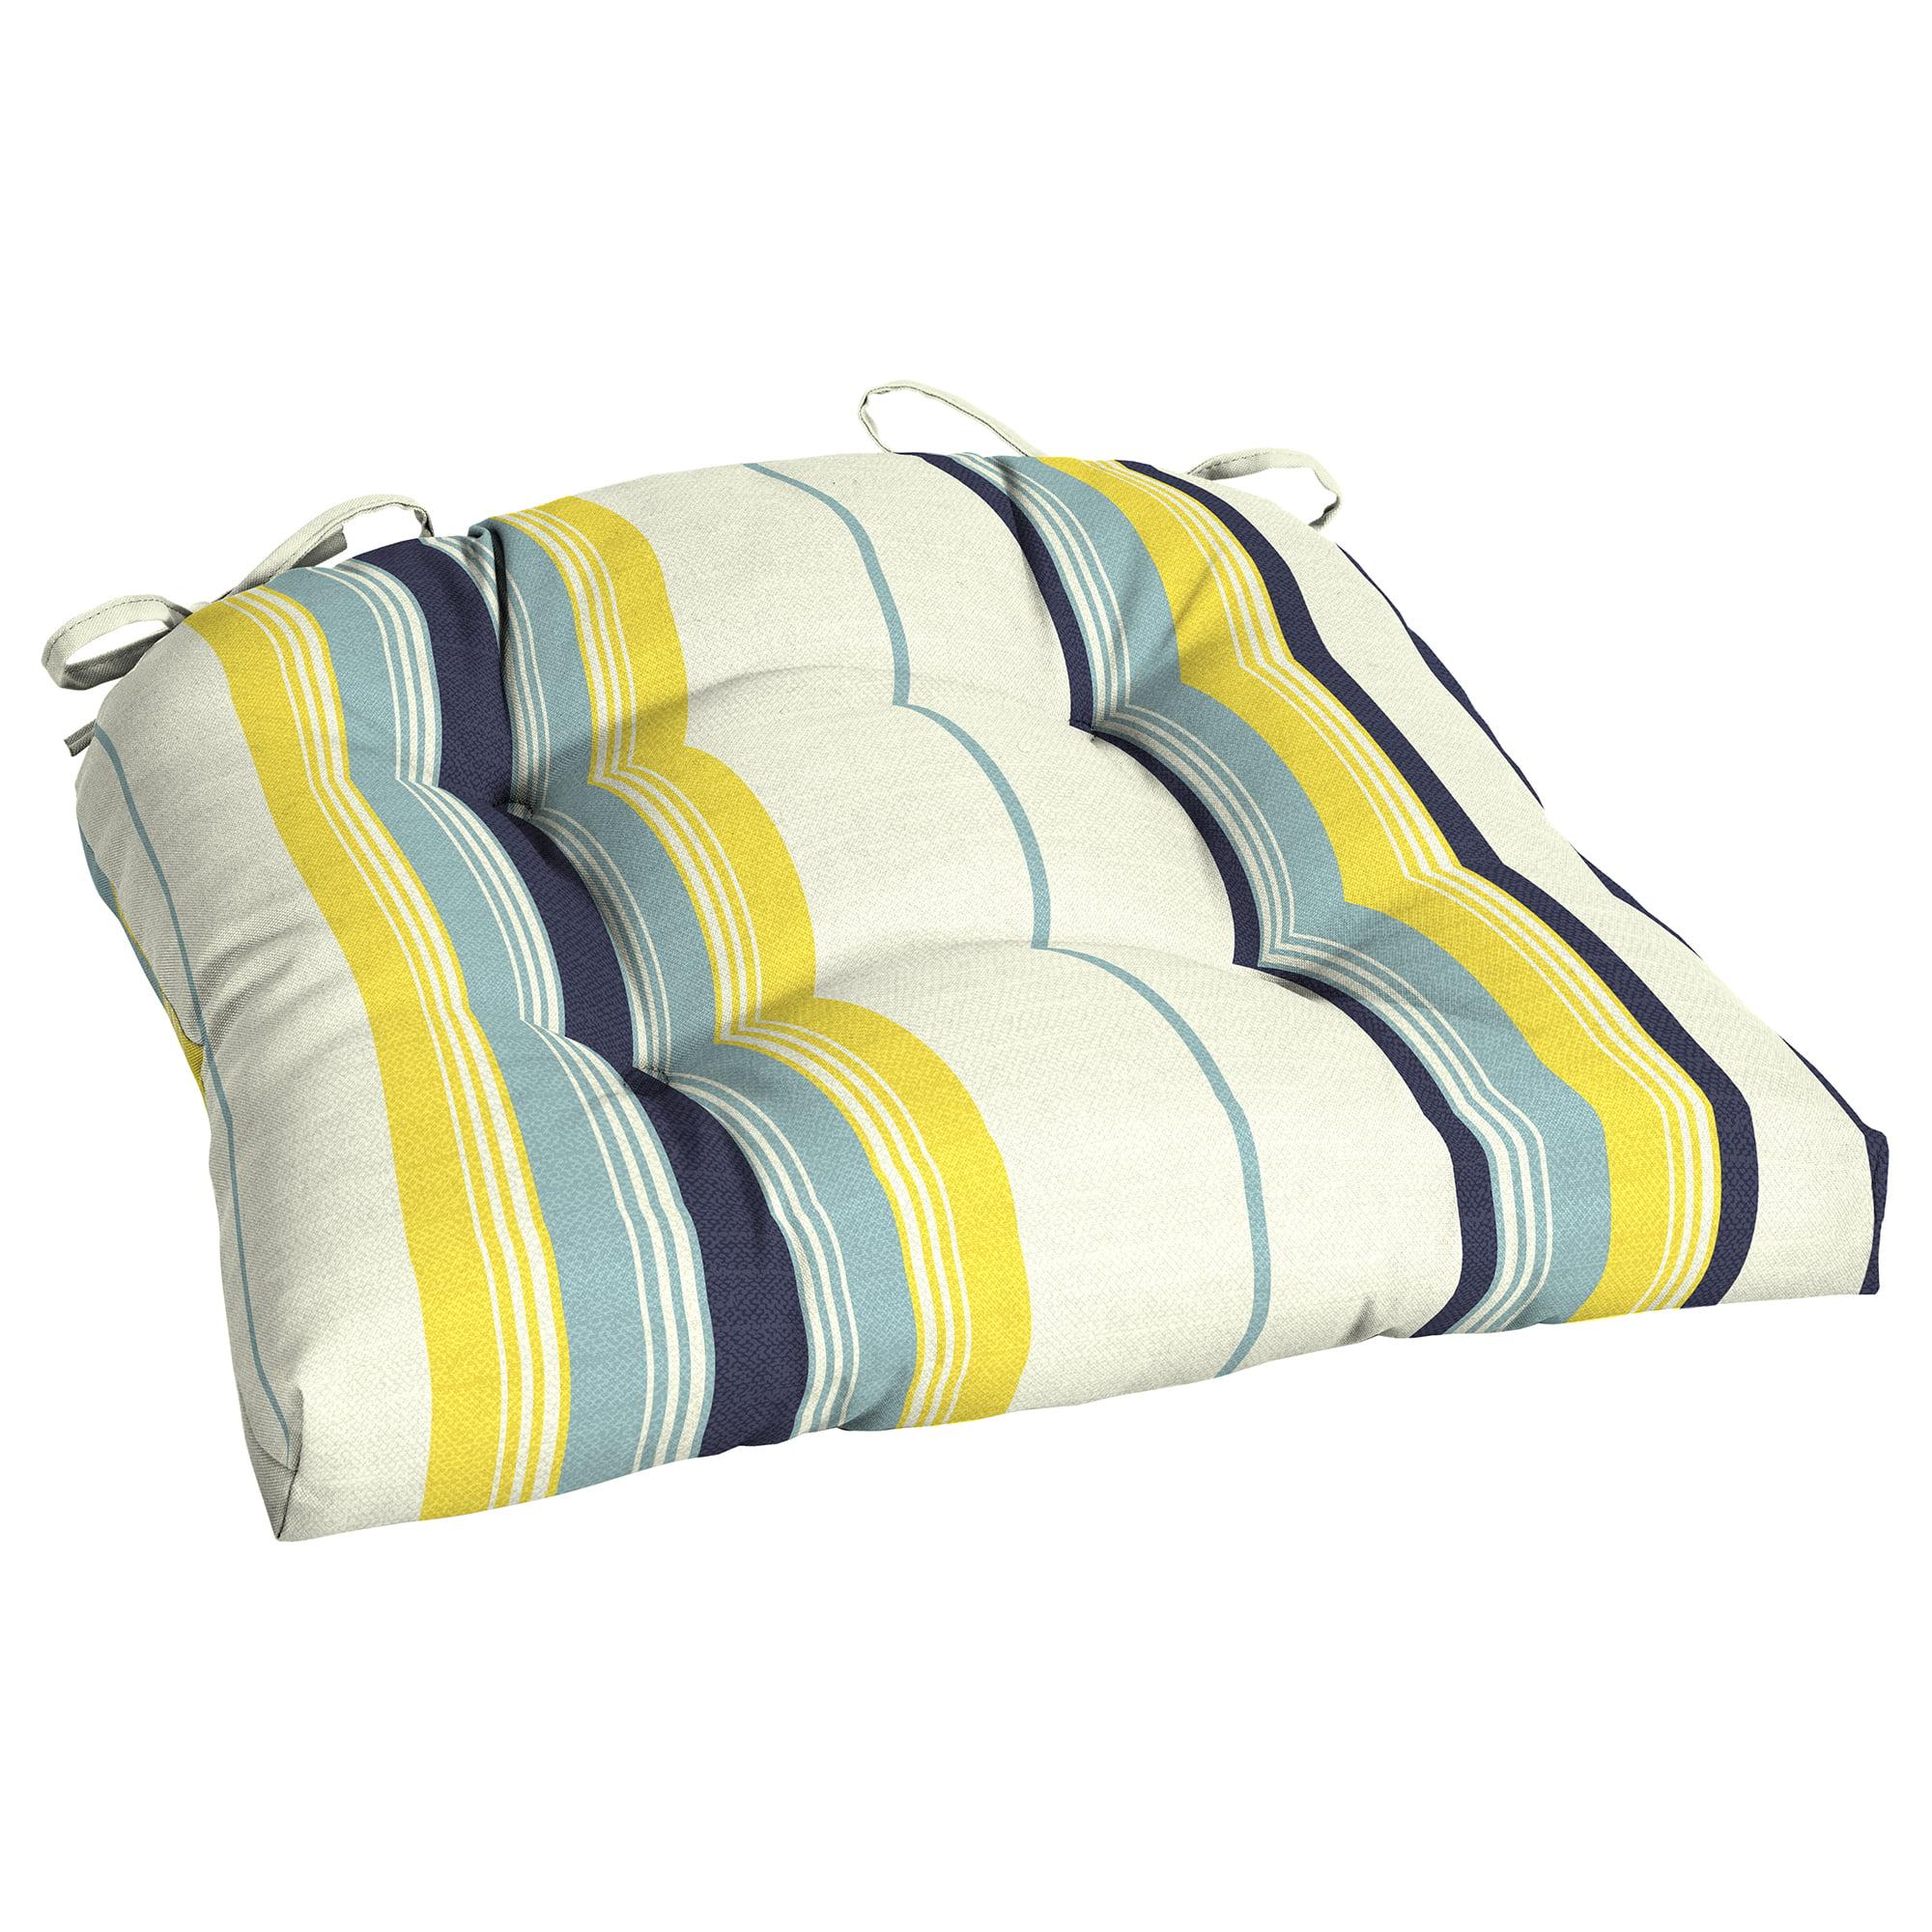 Mainstays Bell Gardens Stripe Outdoor Patio Wicker Seat Cushion